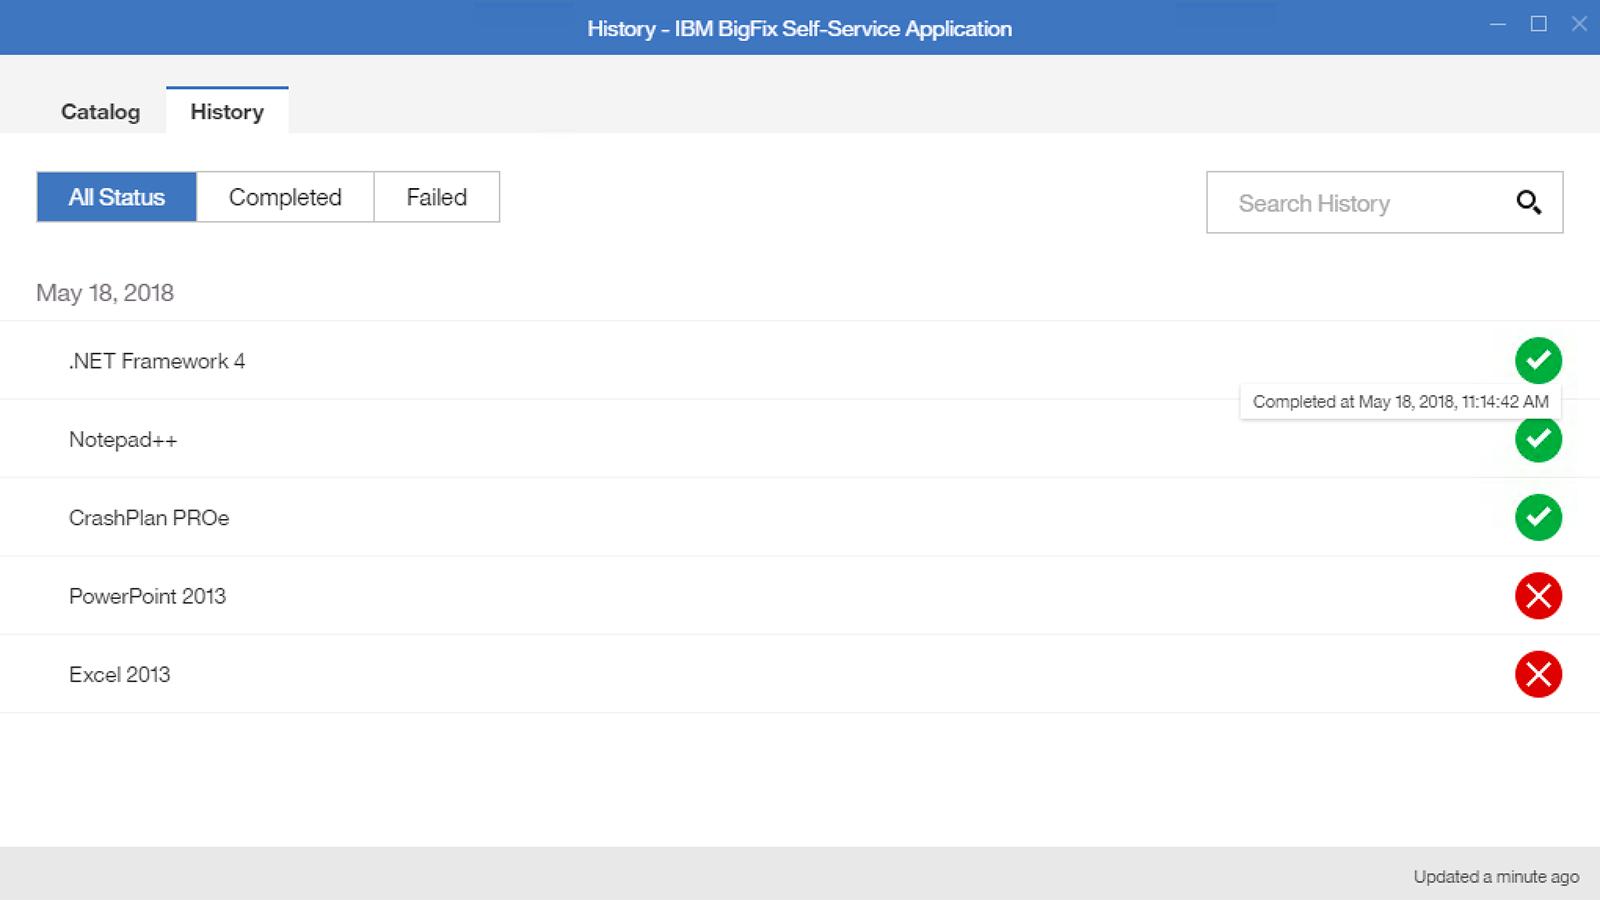 Self-Service-Anwendung – Administratoraktionen